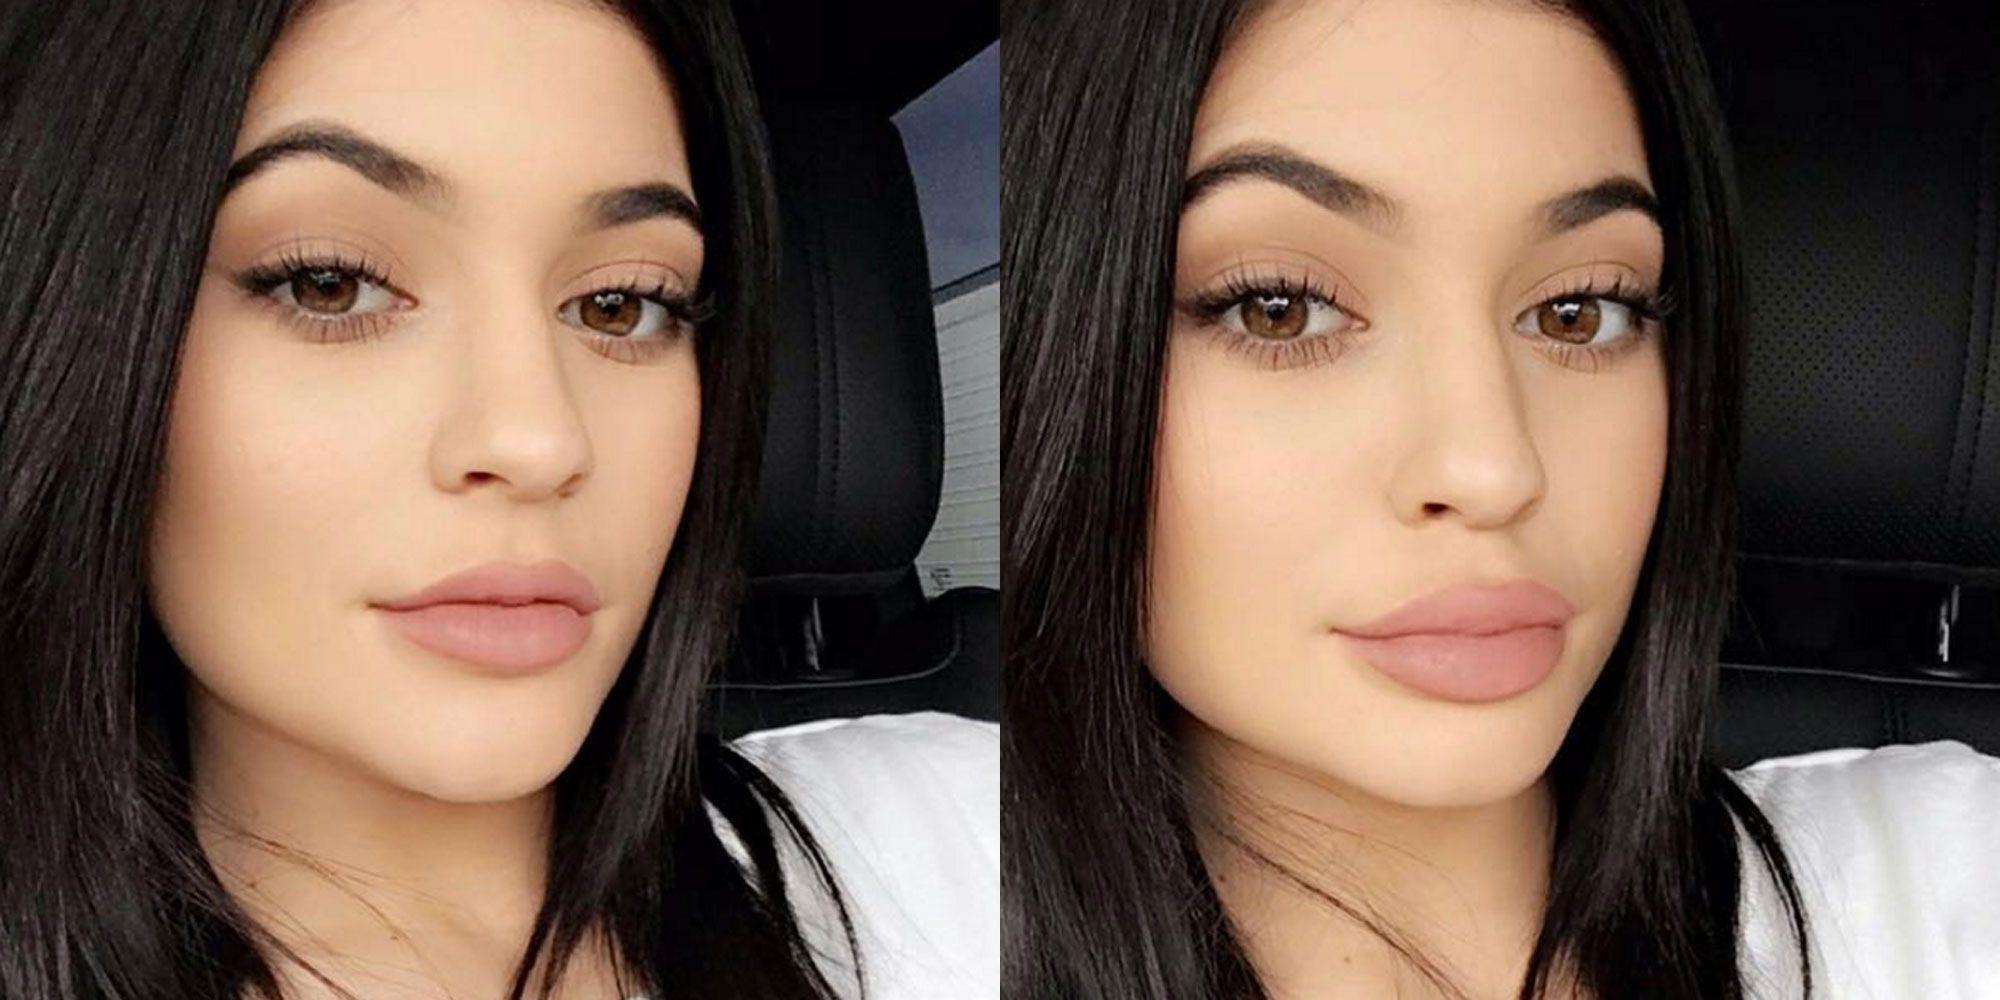 Kylie Jenner Big Lip Camera Trick Kylie Jenner Reveals Injection Free Hack To Fuller Lips